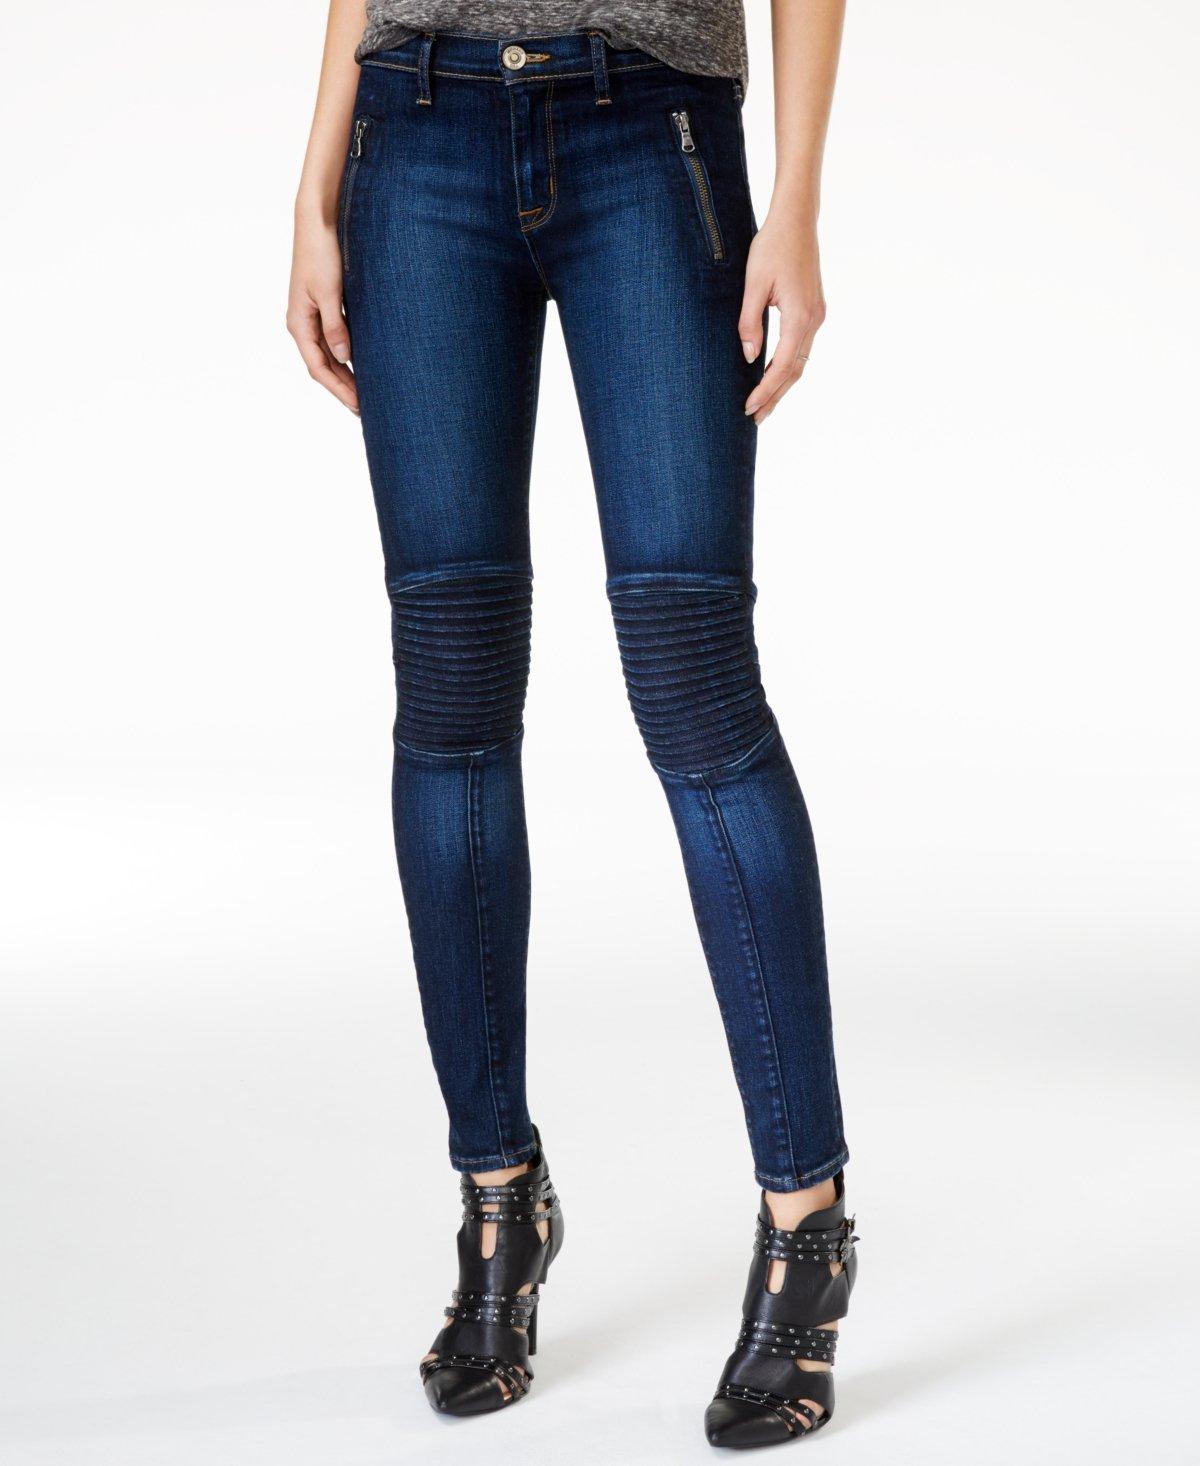 Hudson Jeans Women's 'Stark' Moto Skinny Jeans (26, Civilian Wash)